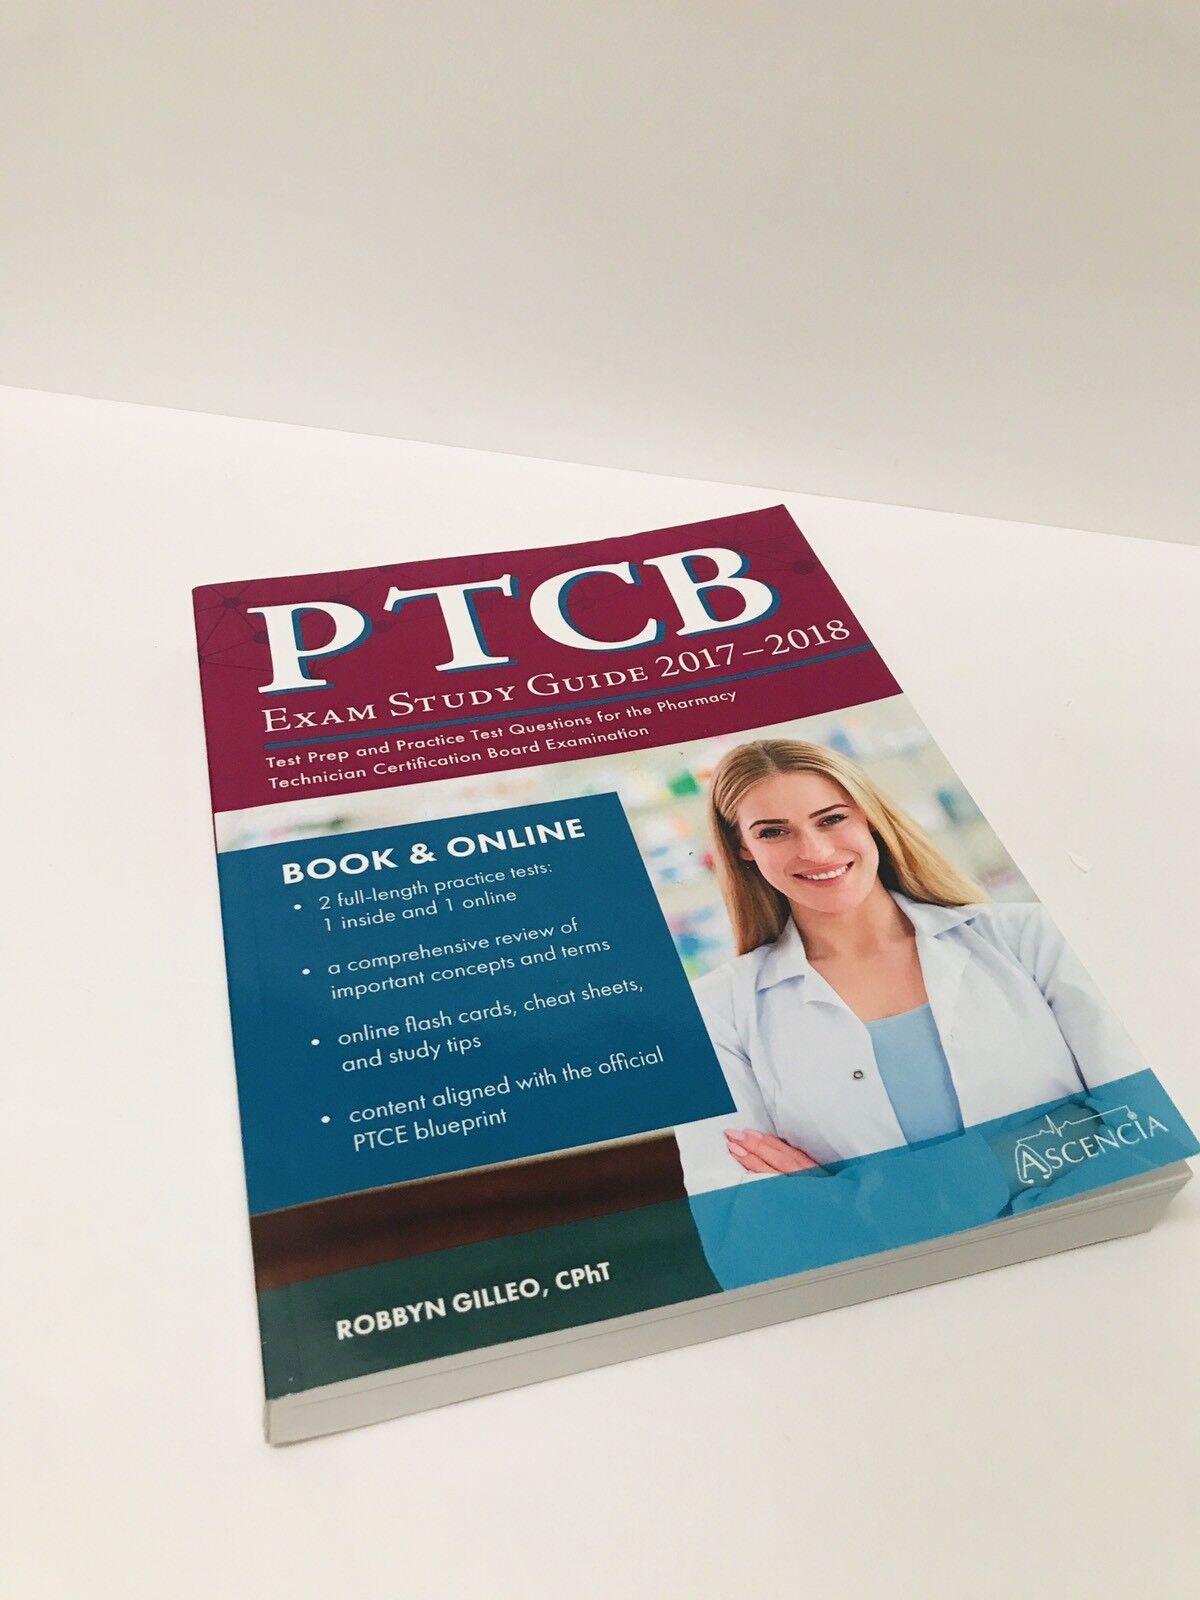 PTCB 2017 2018 Pharmacy Technician Exam Prep Study Guide Practice Questions  | eBay